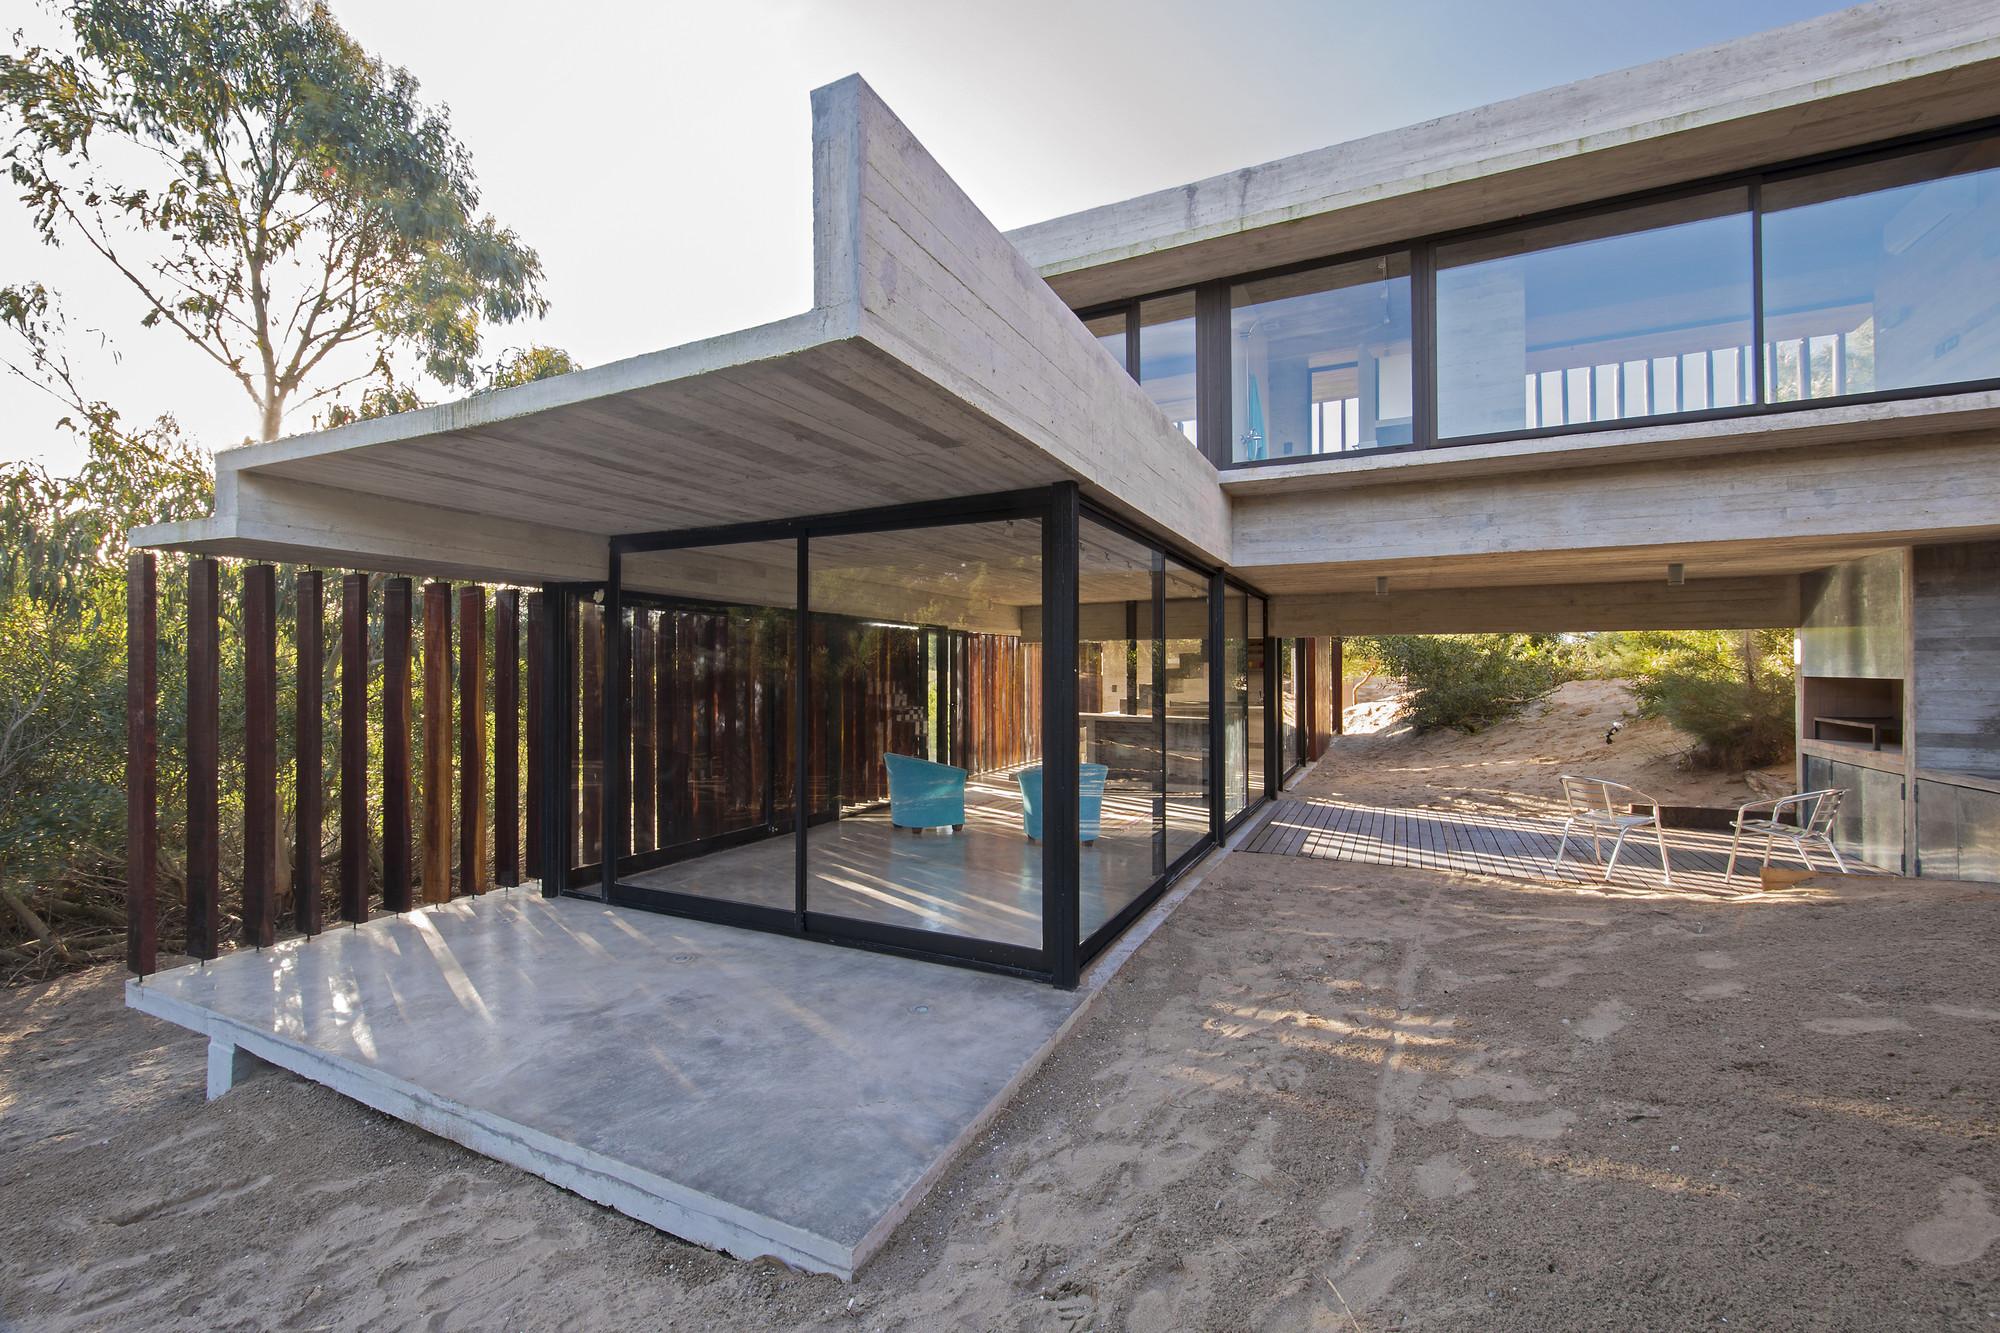 MR House / Luciano Kruk Arquitectos      , © Daniela Mac Adden